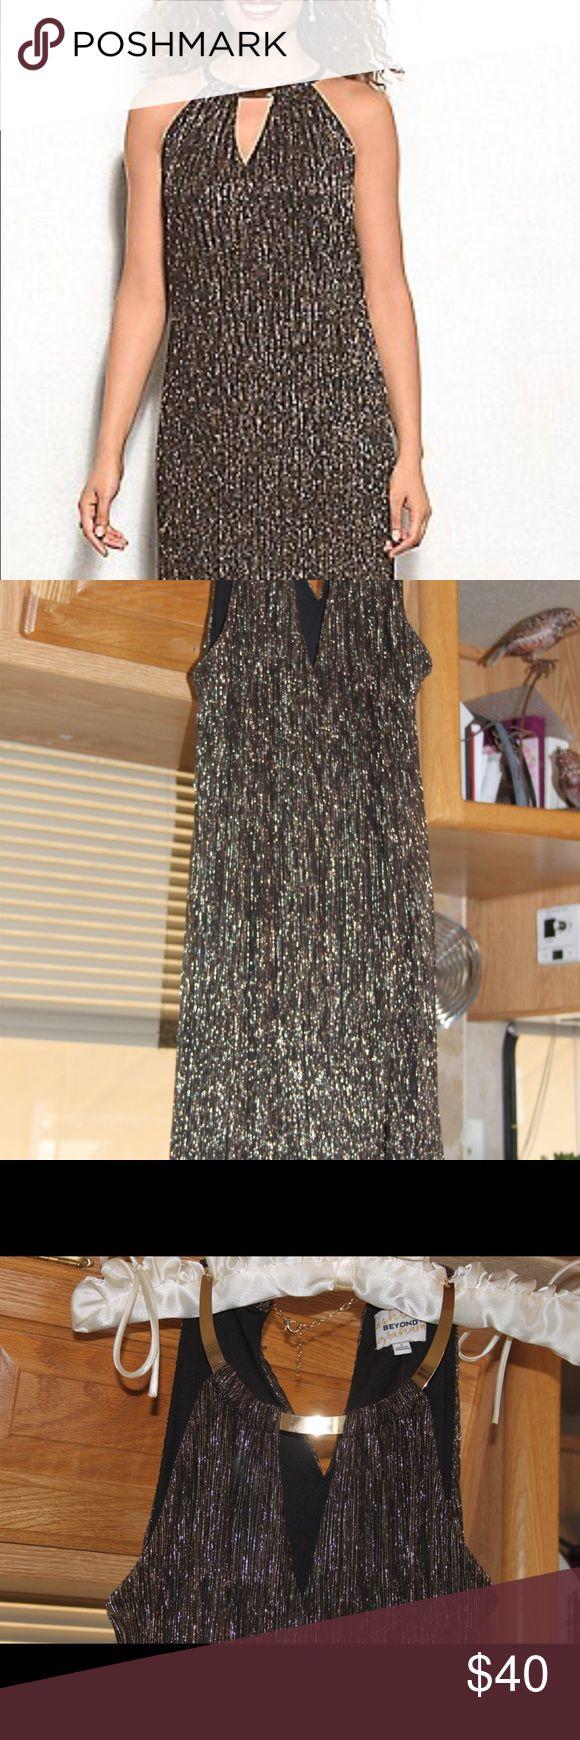 Ashley Graham party dress Ashley Graham Beyond  Metallic in blacks, copper, silver Fully lined in black  Slight high low hem  Size 4 BNWT Ashley Graham Dresses High Low